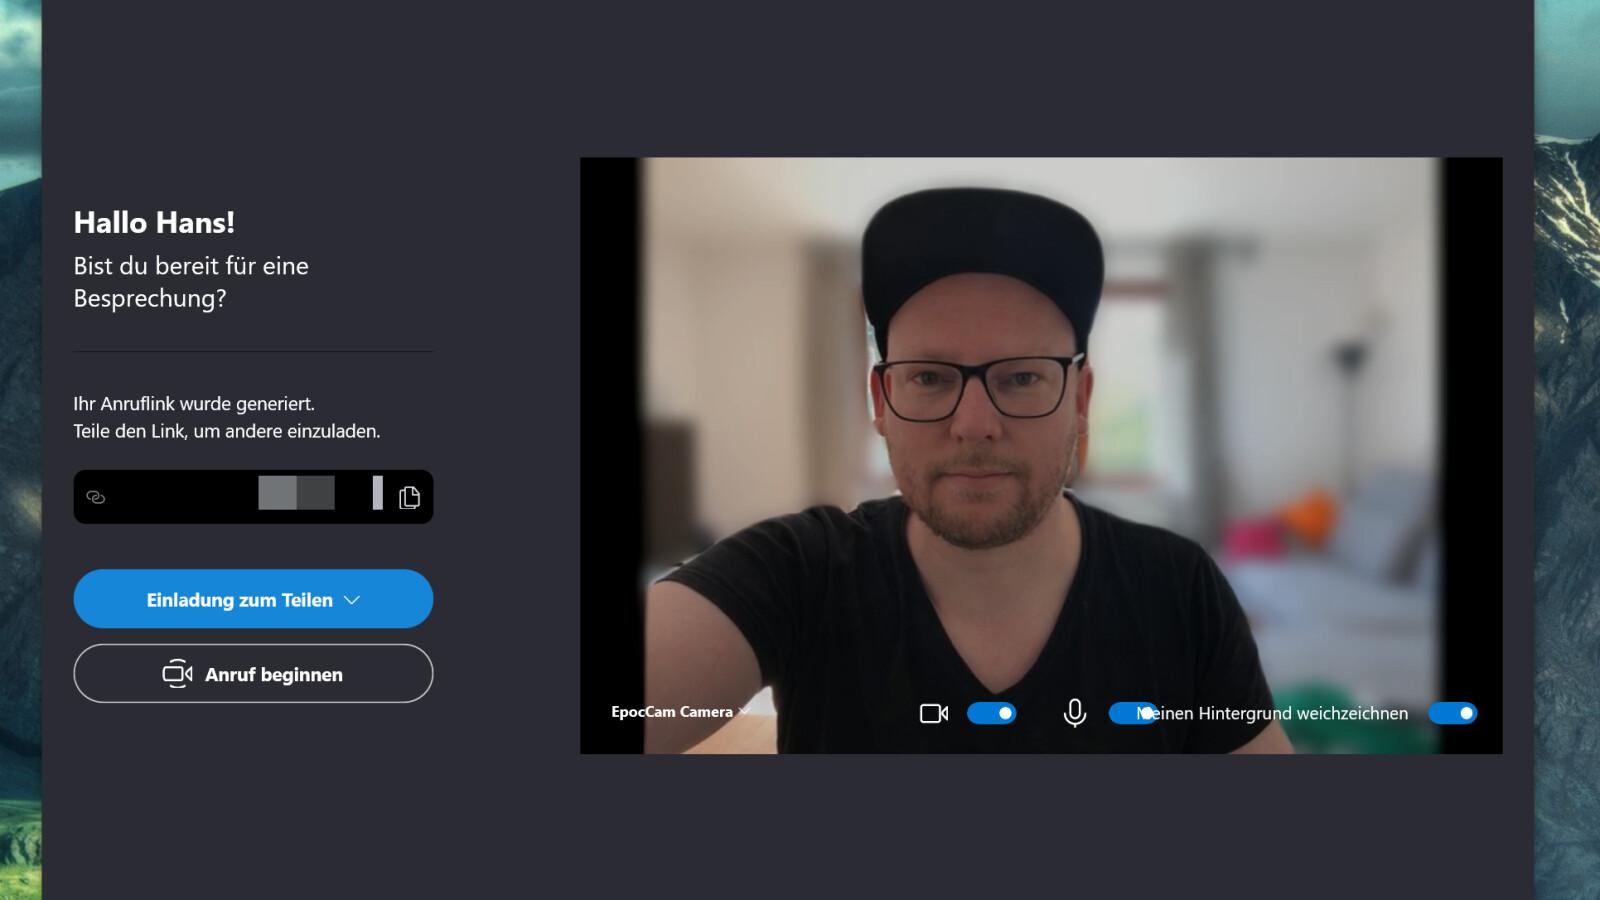 Android Handy Als Webcam